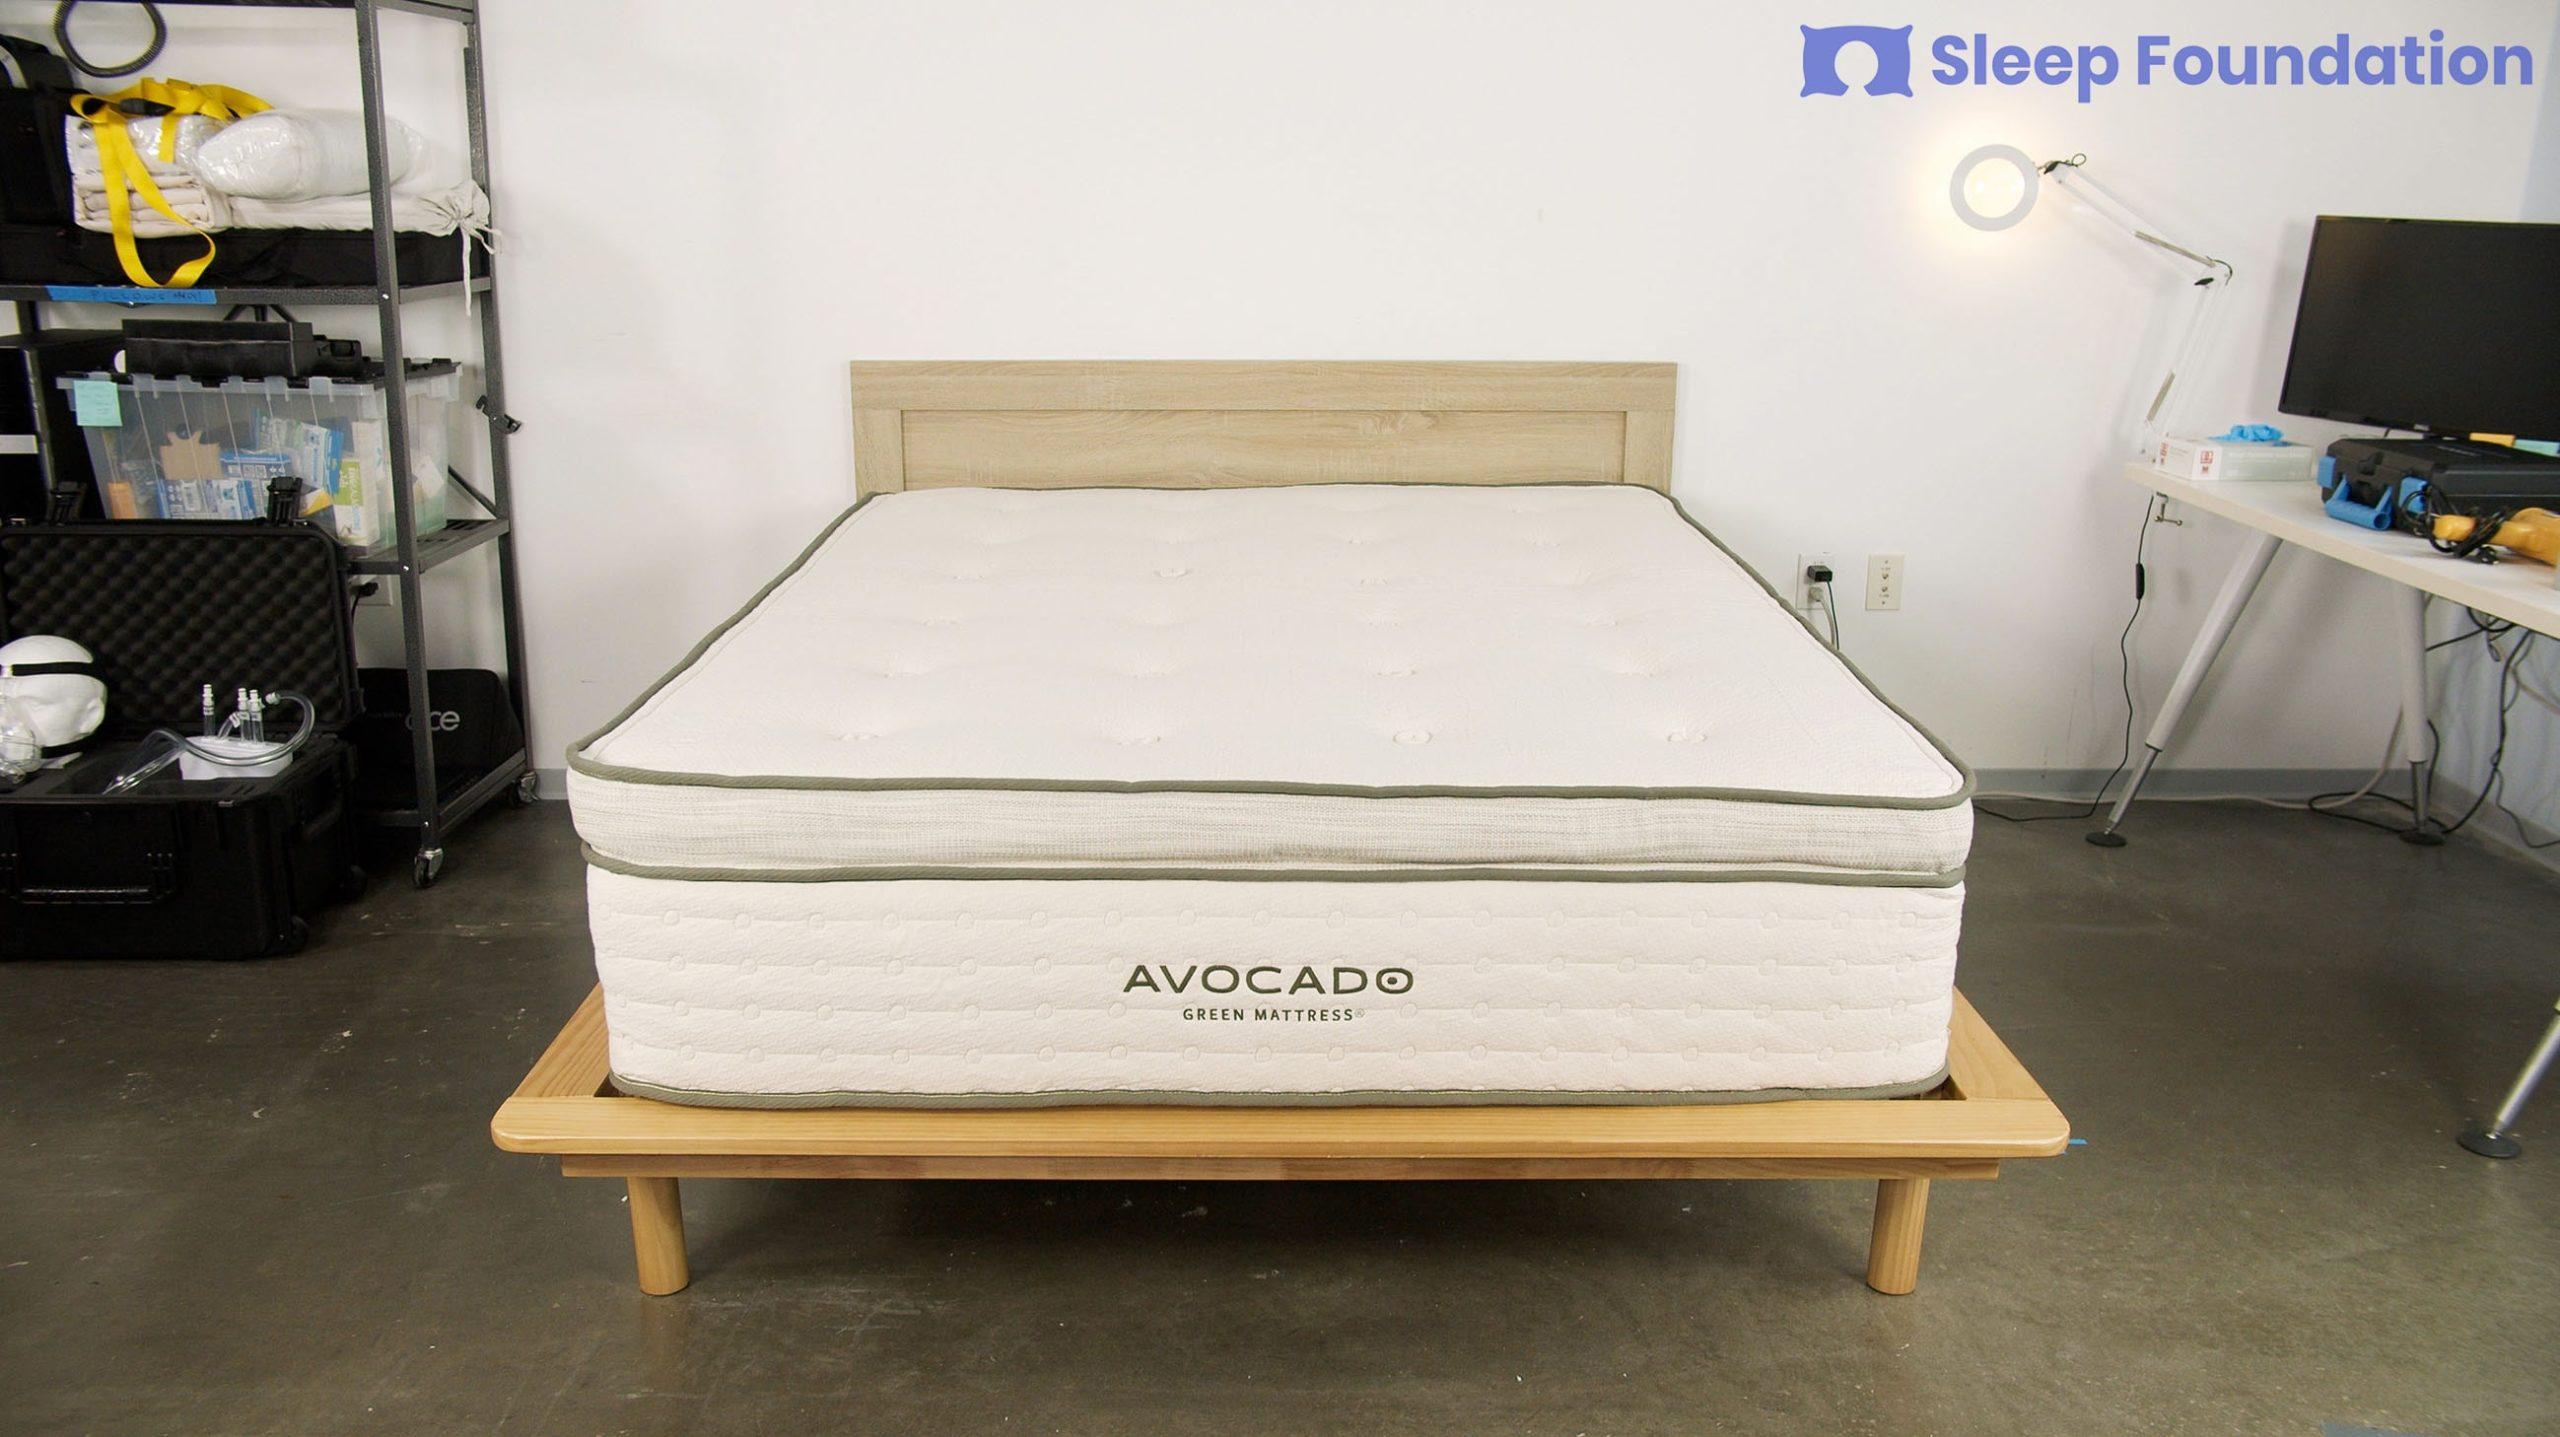 avocado mattress review 2021 sleep